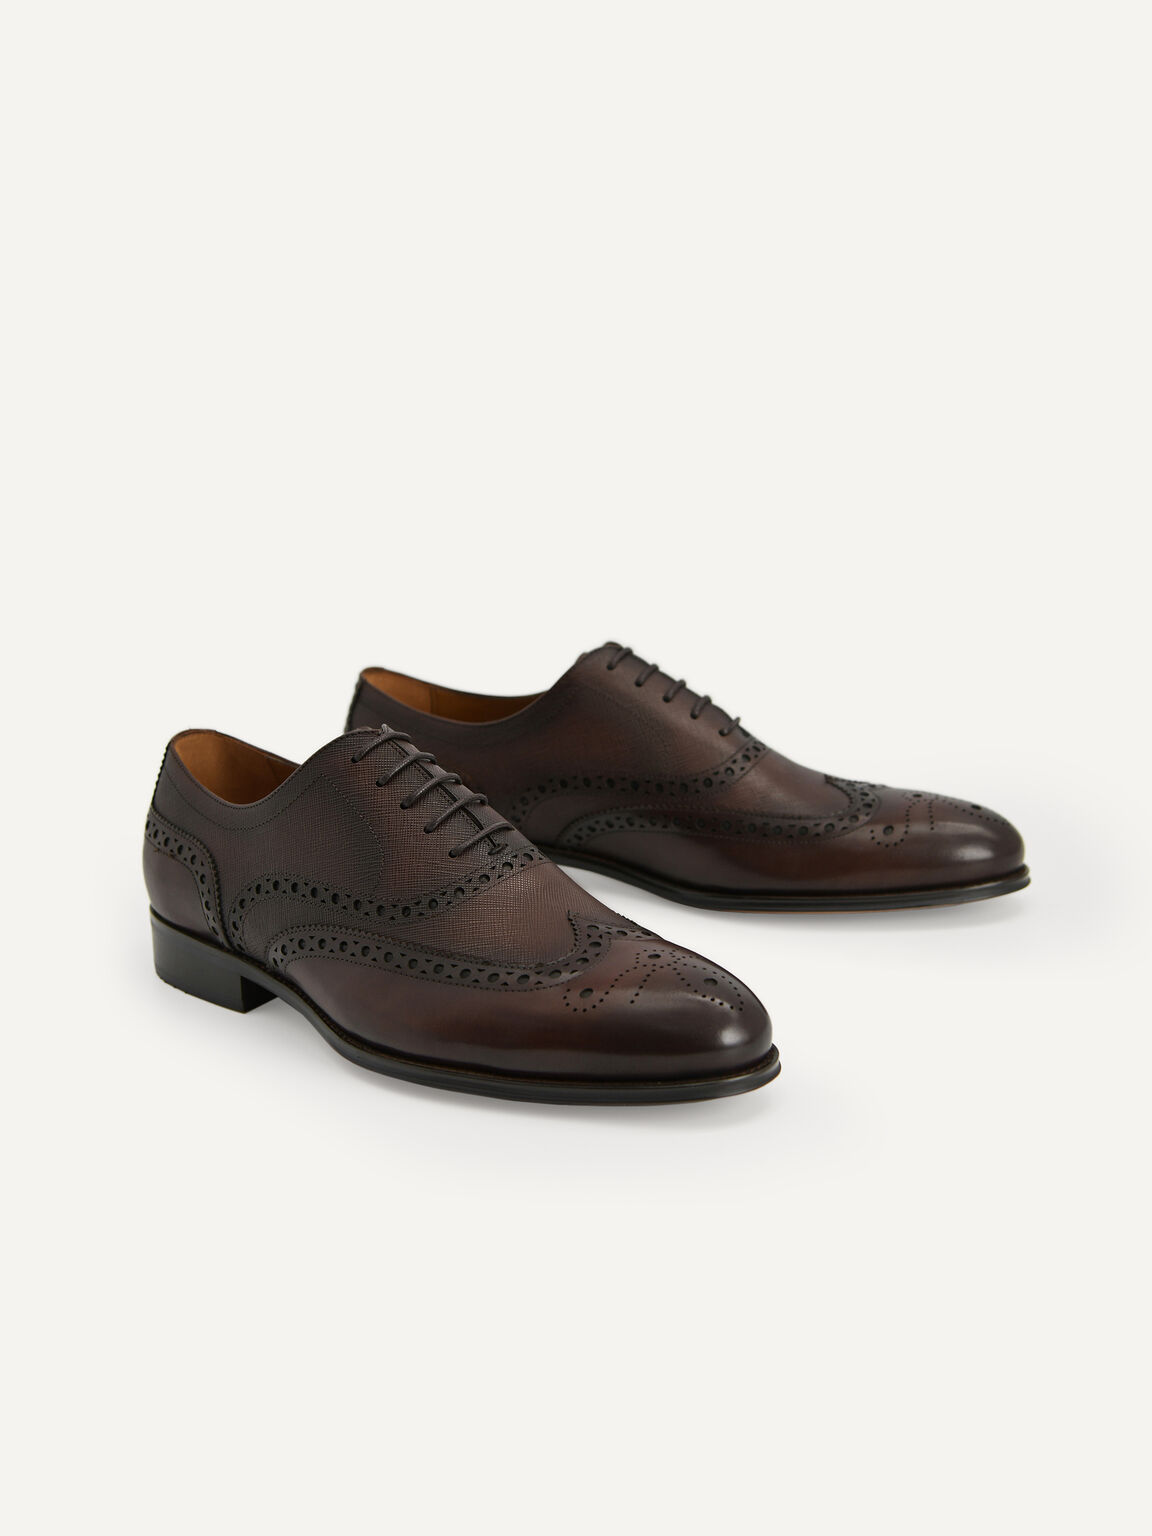 Textured Brogue Oxford Shoes, Dark Brown, hi-res